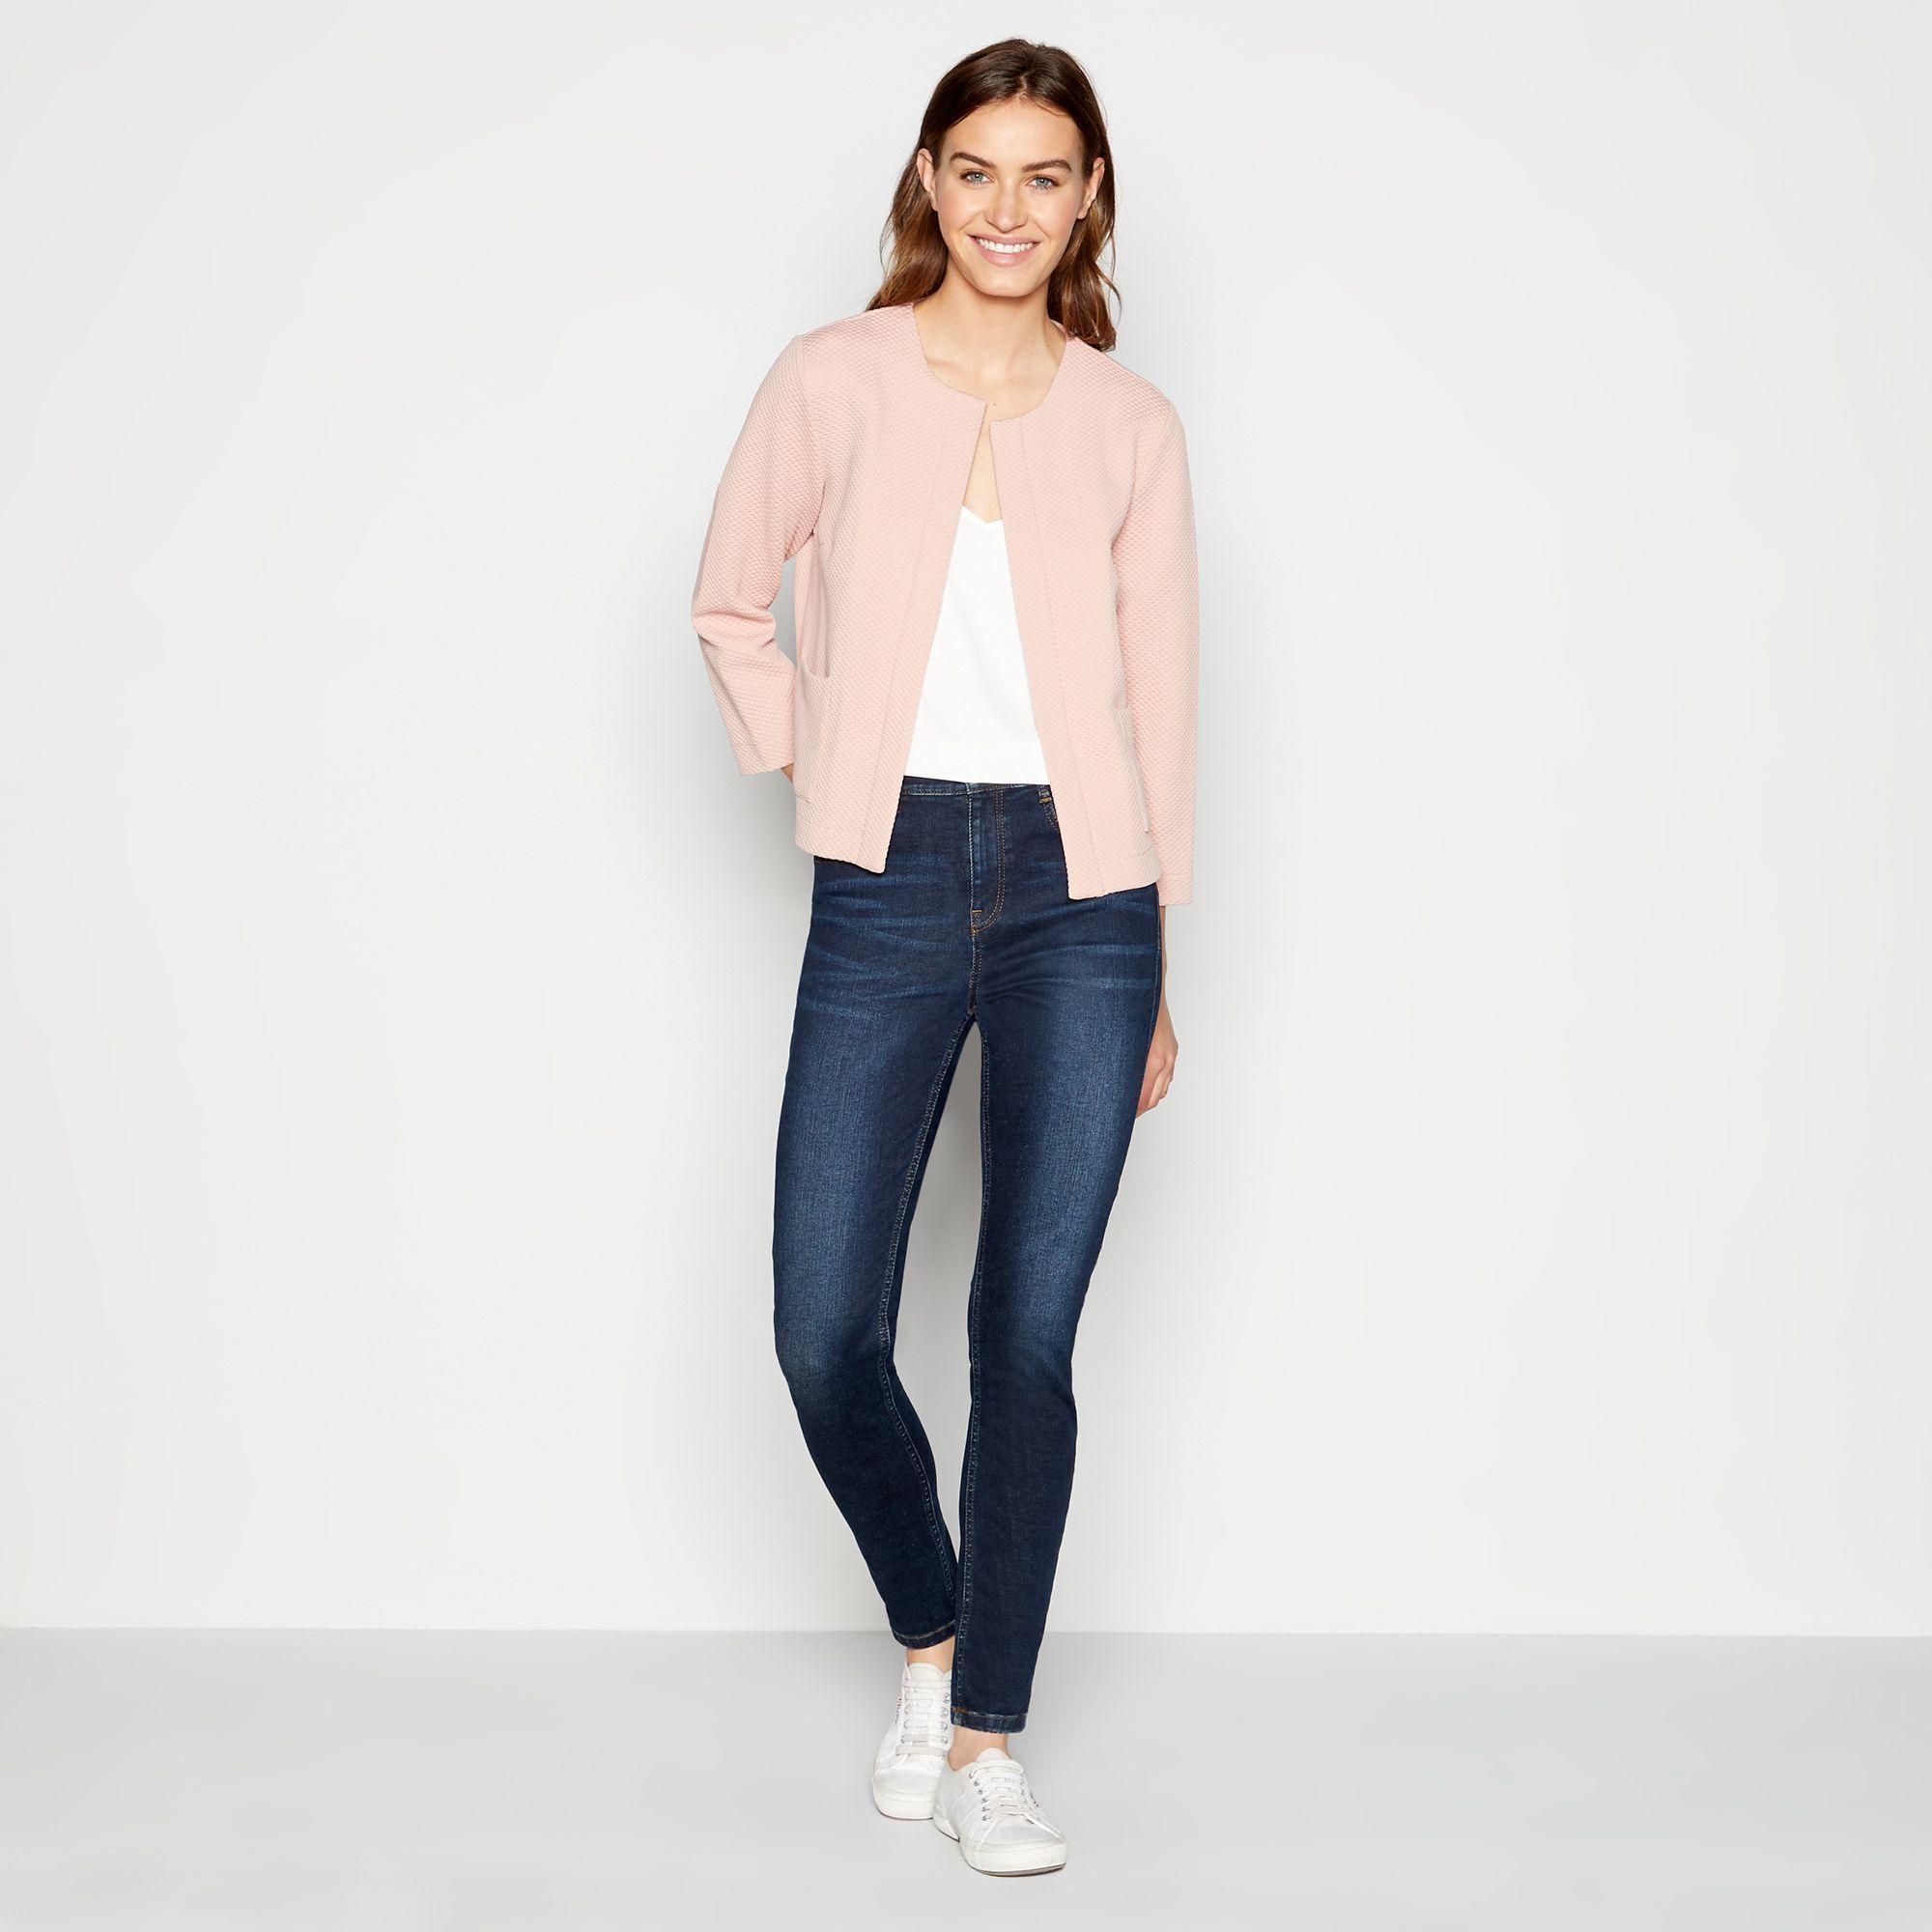 Principles Womens Pale Pink Short Textured Jacket